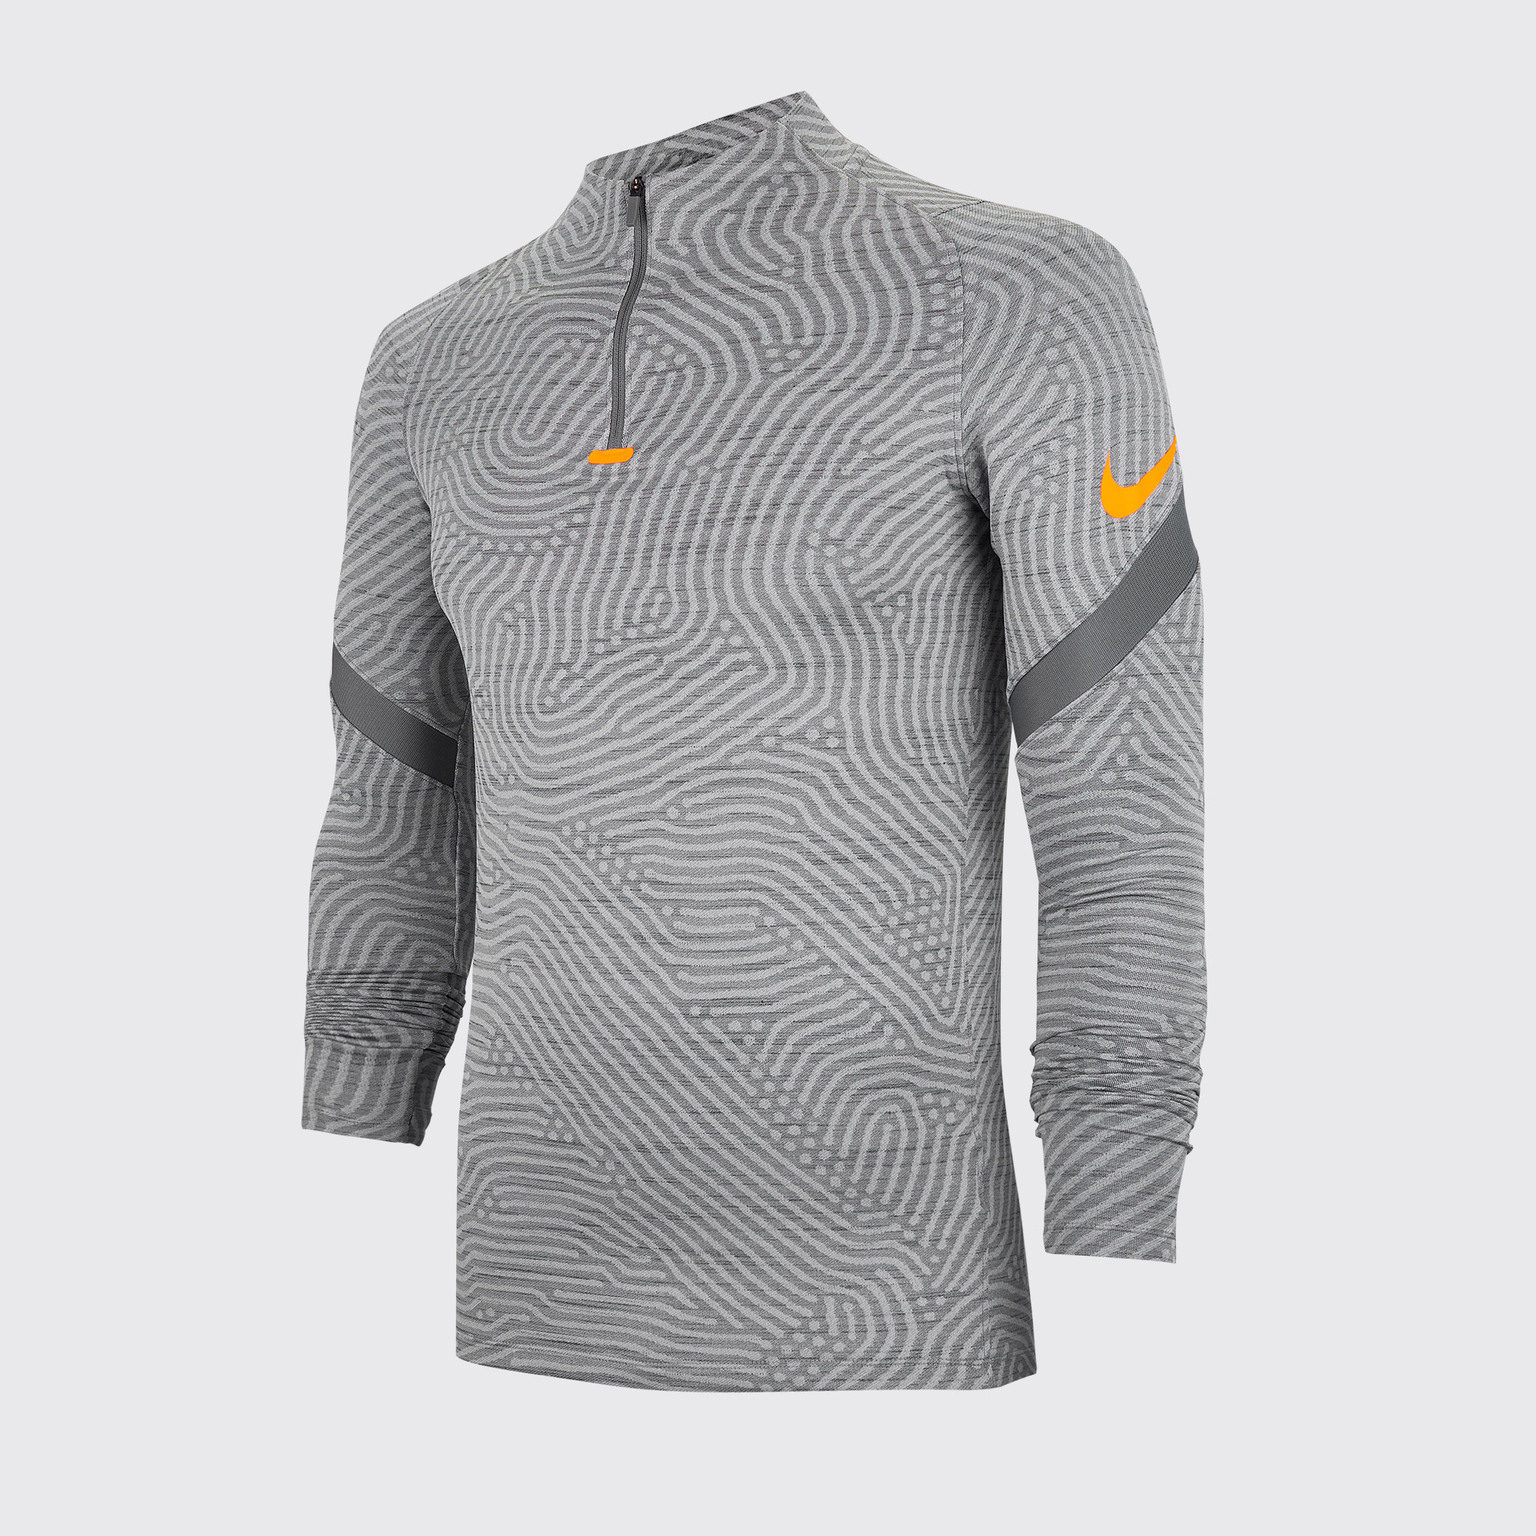 Фото - Свитер тренировочный Nike Dry Strike Dril Top CD0564-084 свитер тренировочный nike dry academy18 dril top ls 893624 451